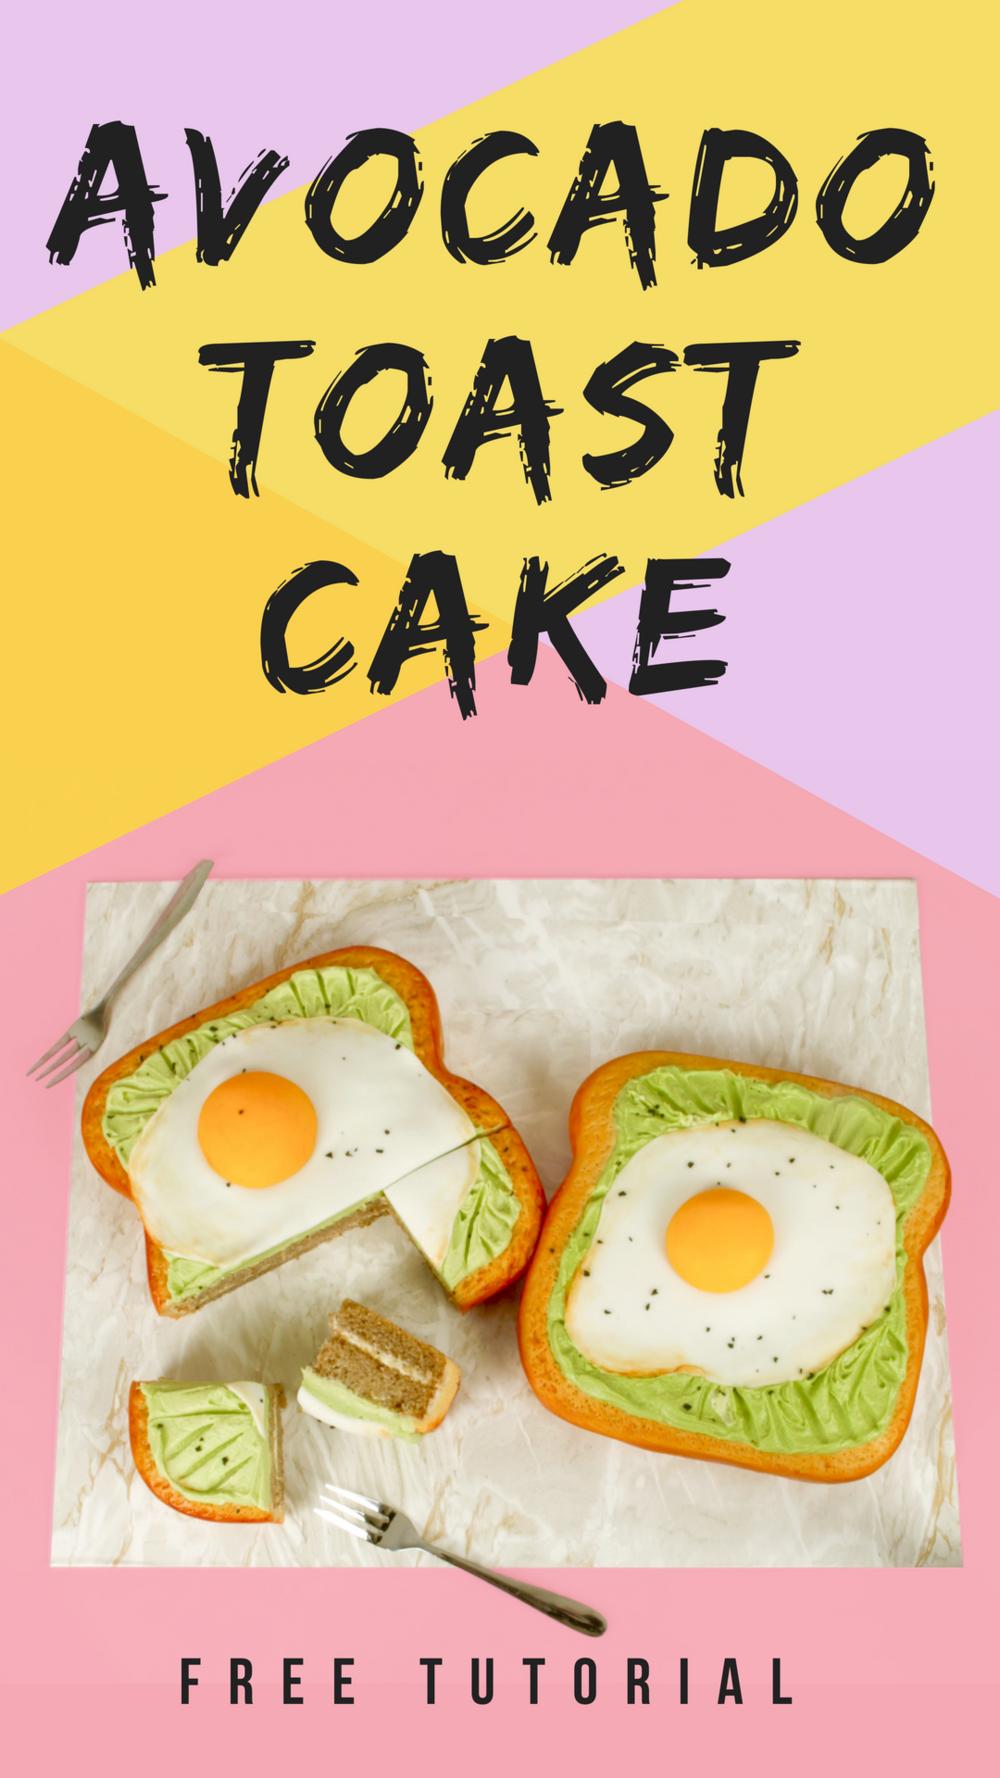 Avocado Toast Cake with fondant fried eggs - free tutorial